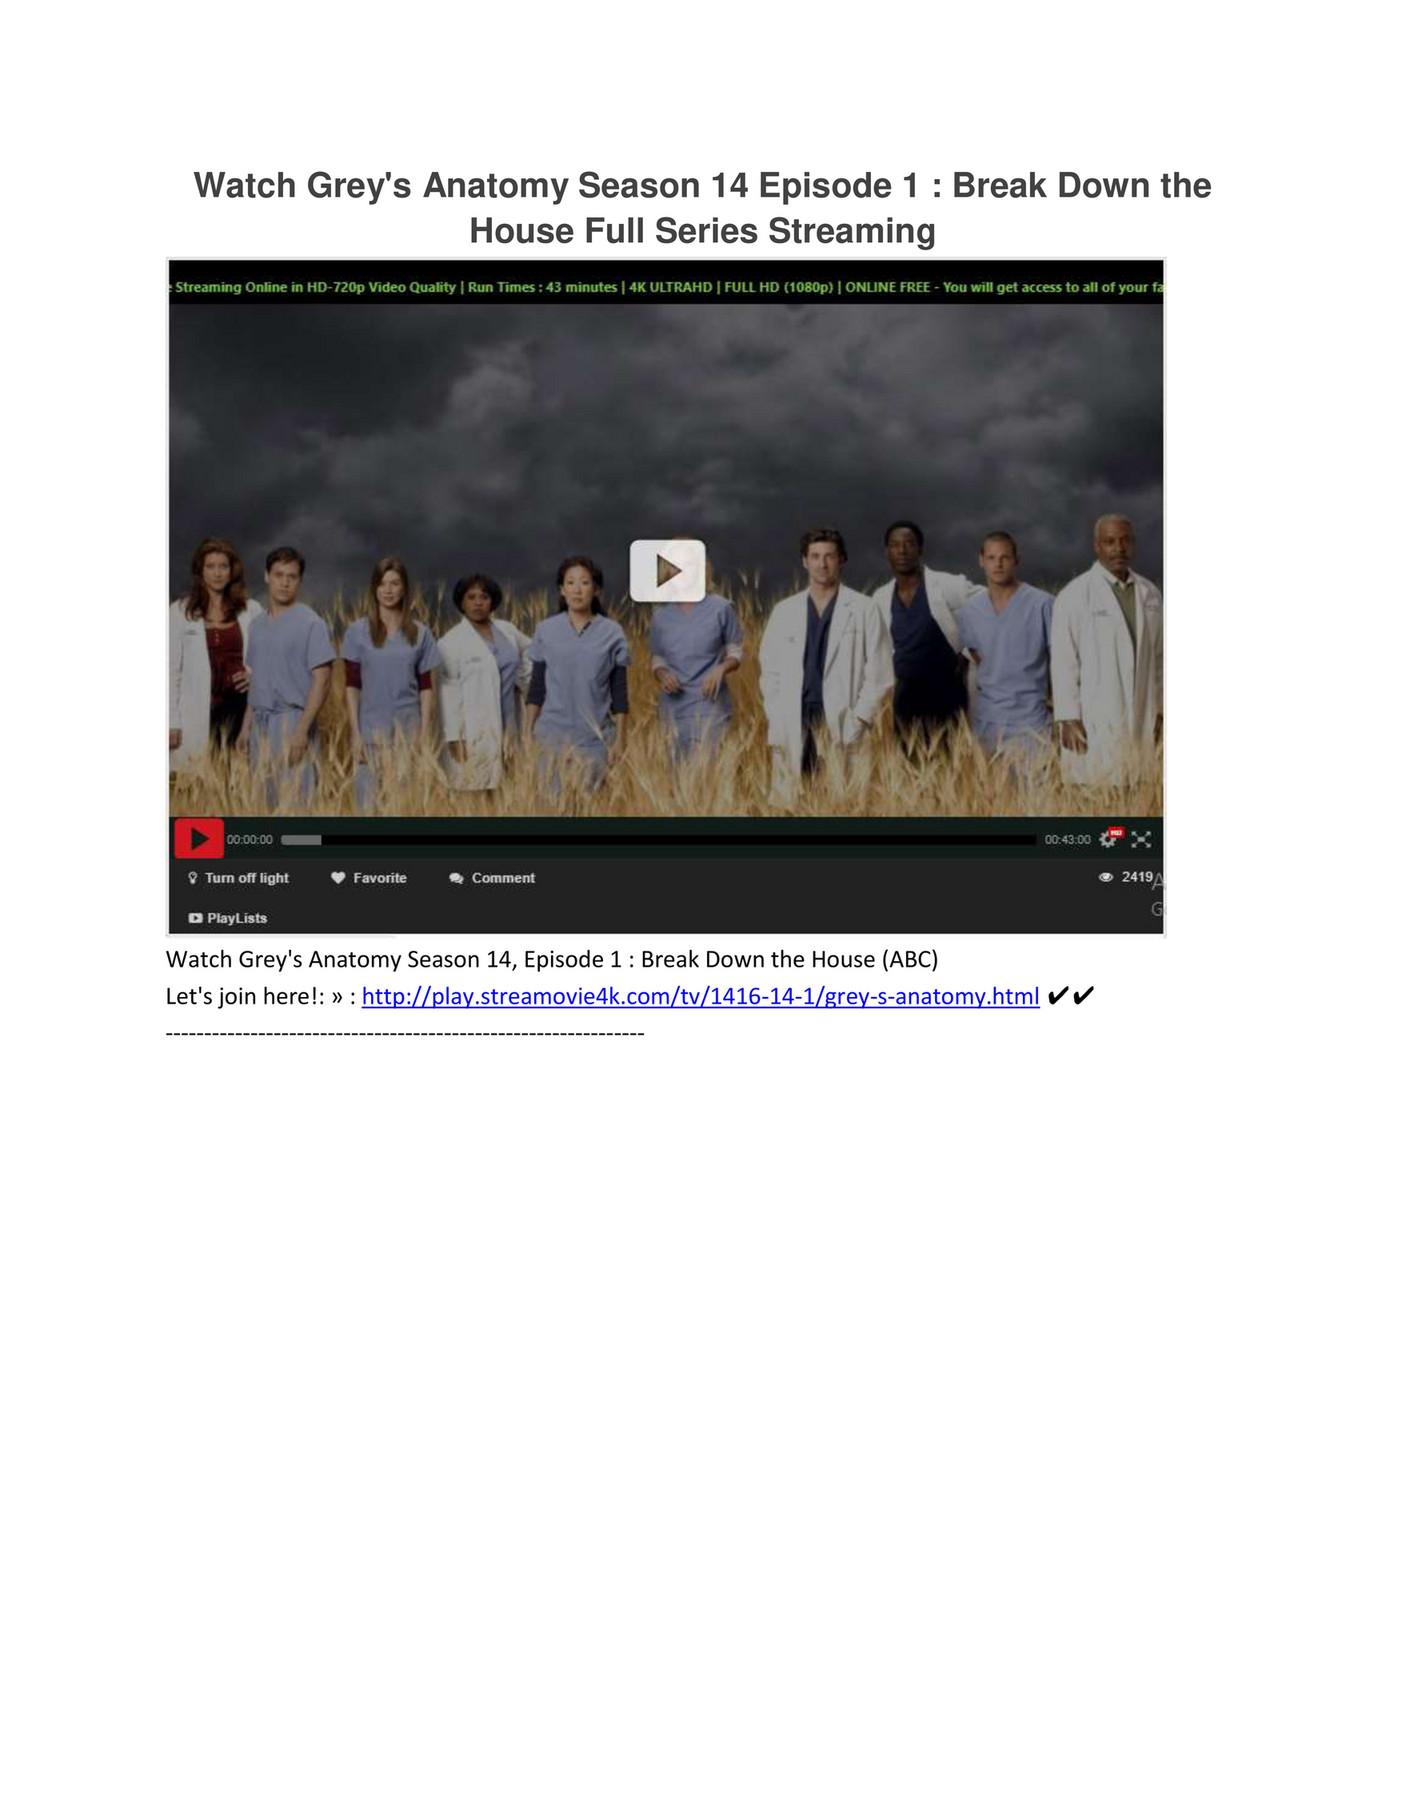 Greys Anatomy 14x1 Season 14 Episode 1 Full Episode Page 2